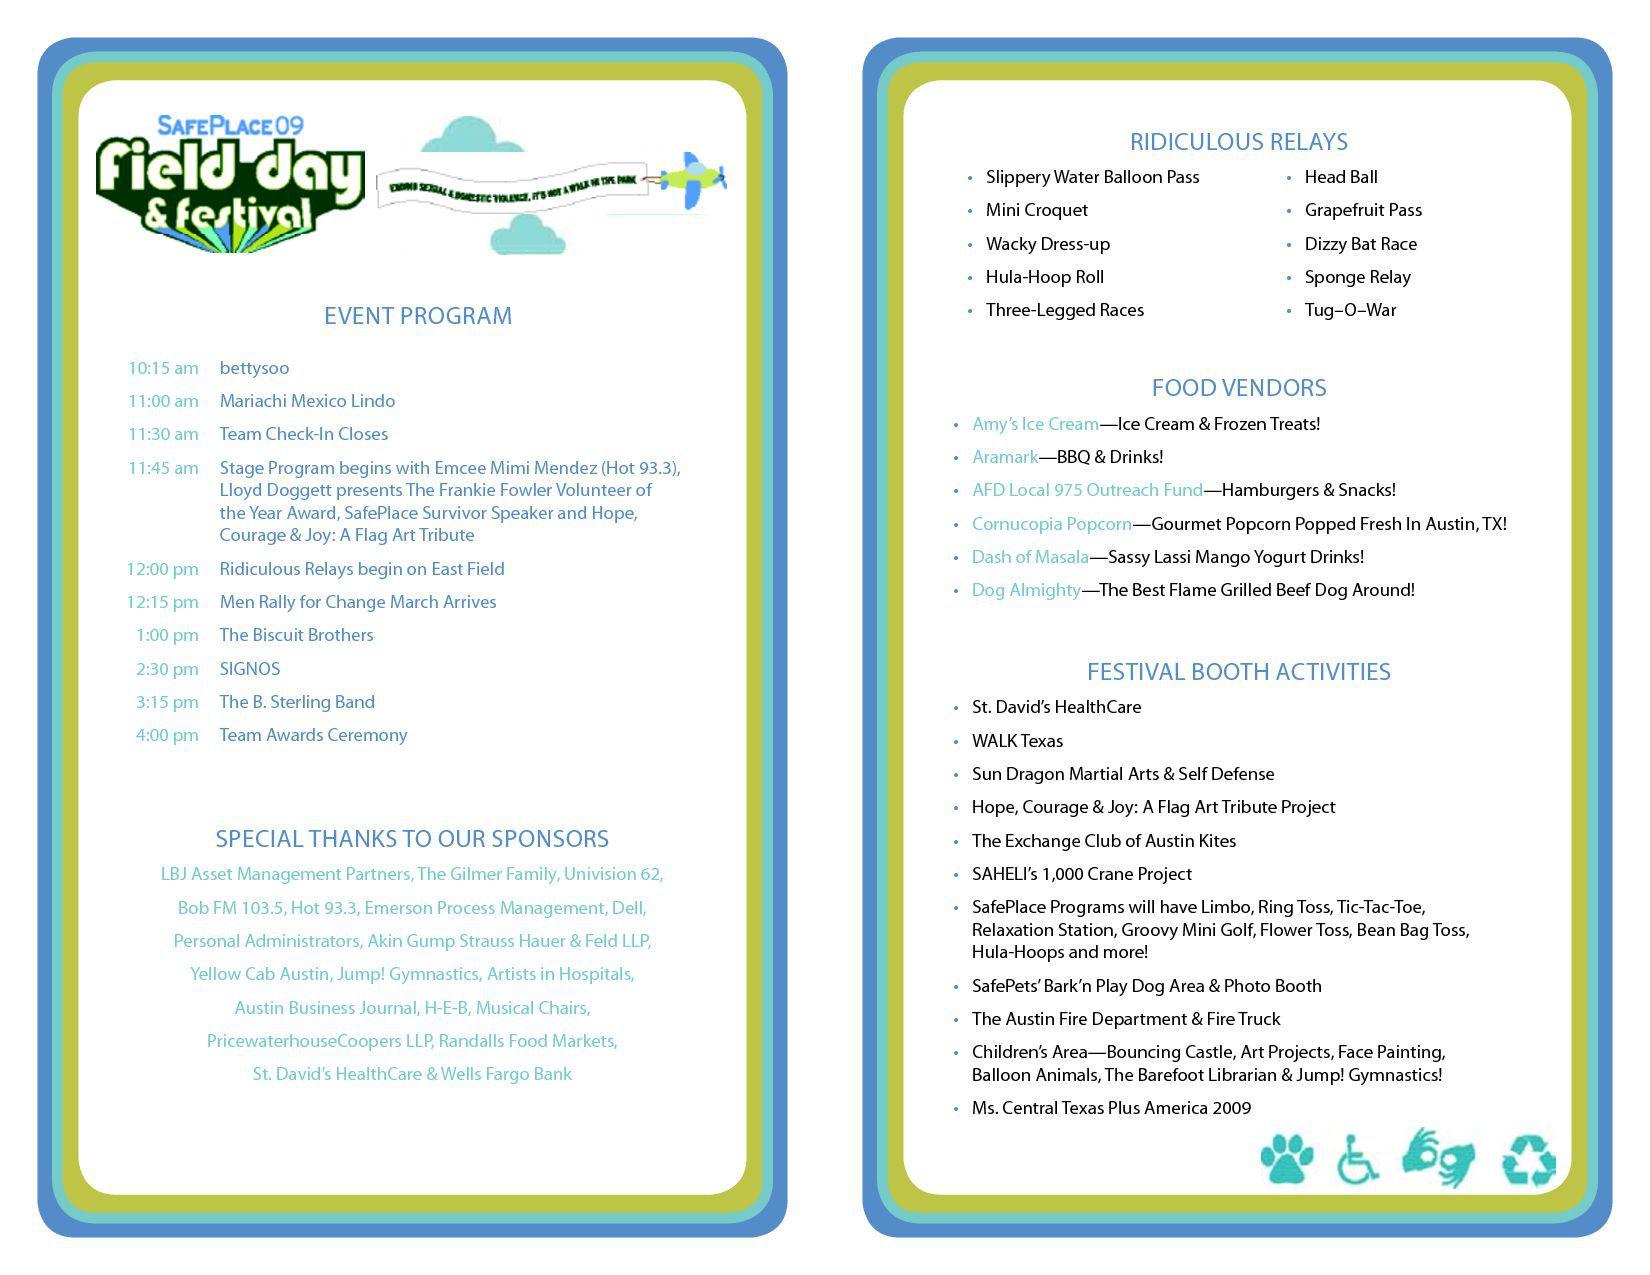 006 Breathtaking Free Event Program Template High Resolution  Schedule Psd WordFull